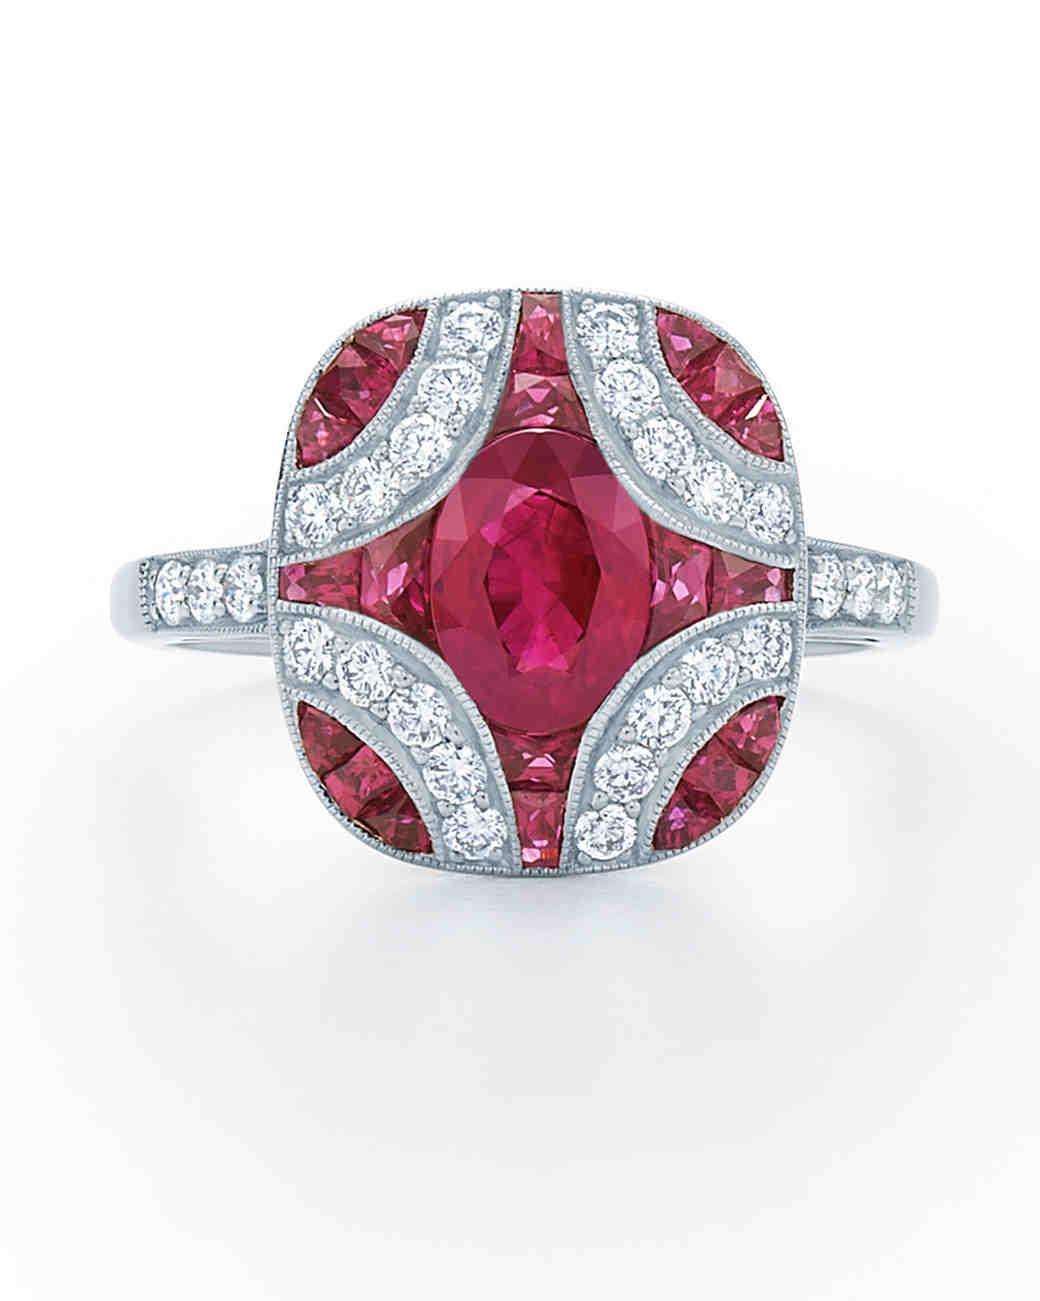 Kwiat Vintage Ruby Engagement Ring With Diamond Detailing: Ruby Wedding Ring Set 18k At Reisefeber.org